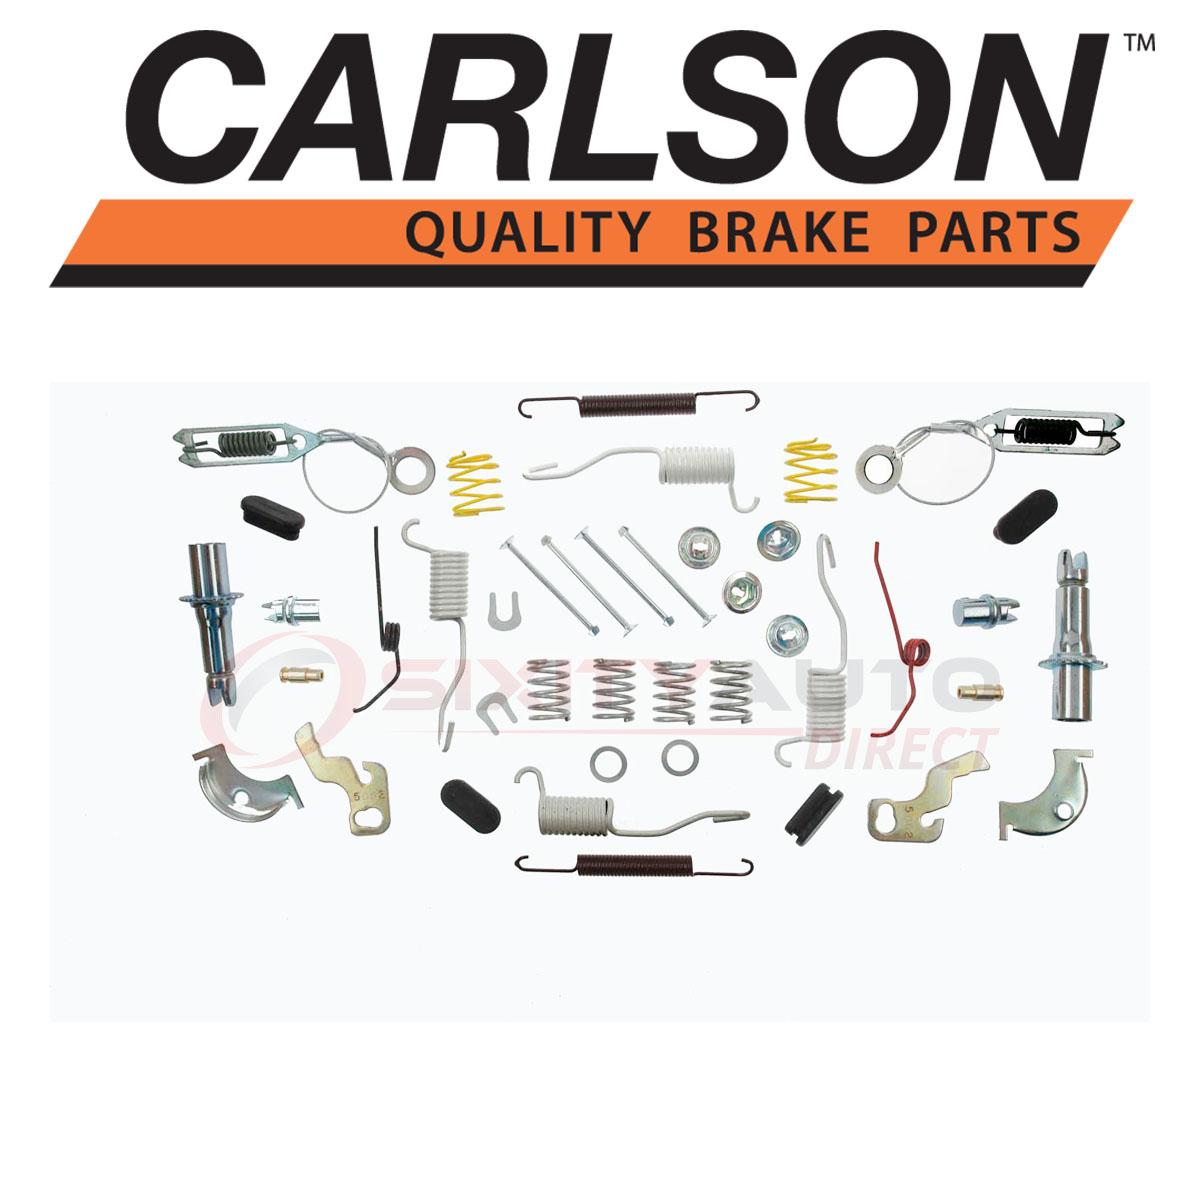 Shoe yn Carlson Rear Drum Brake Hardware Kit for 1990-2006 Jeep Wrangler